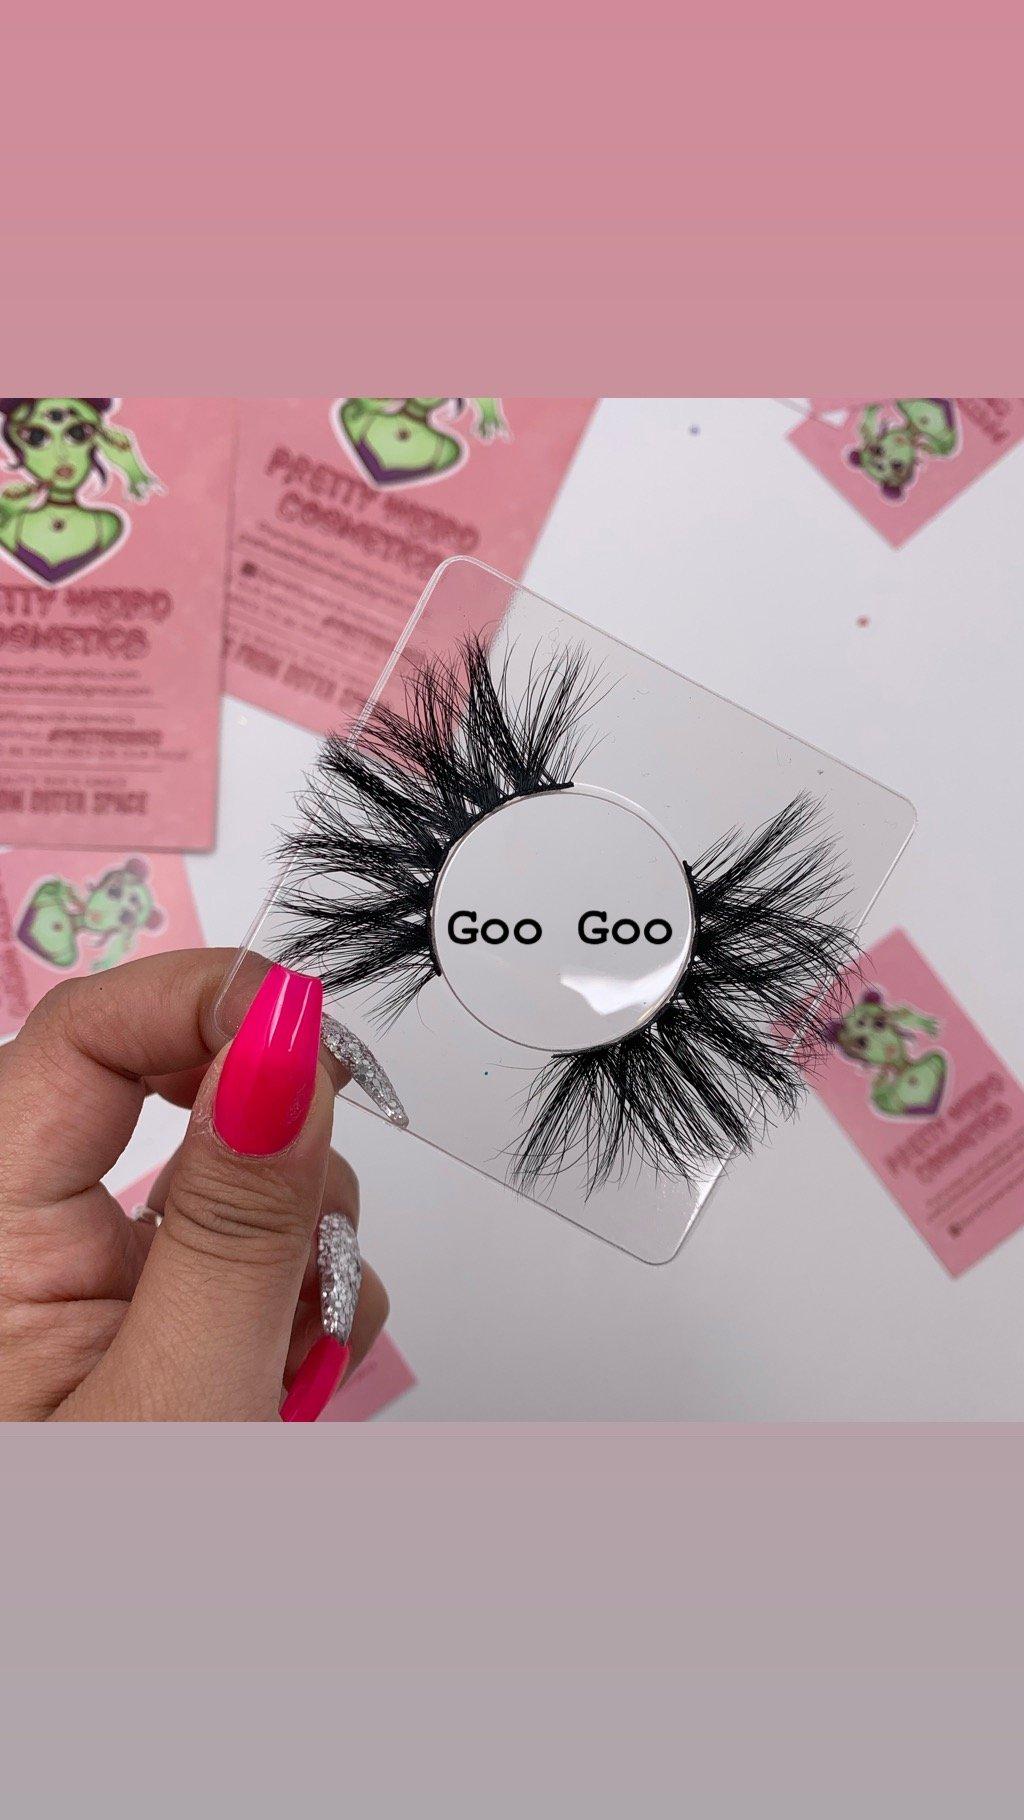 Image of GOO GOO